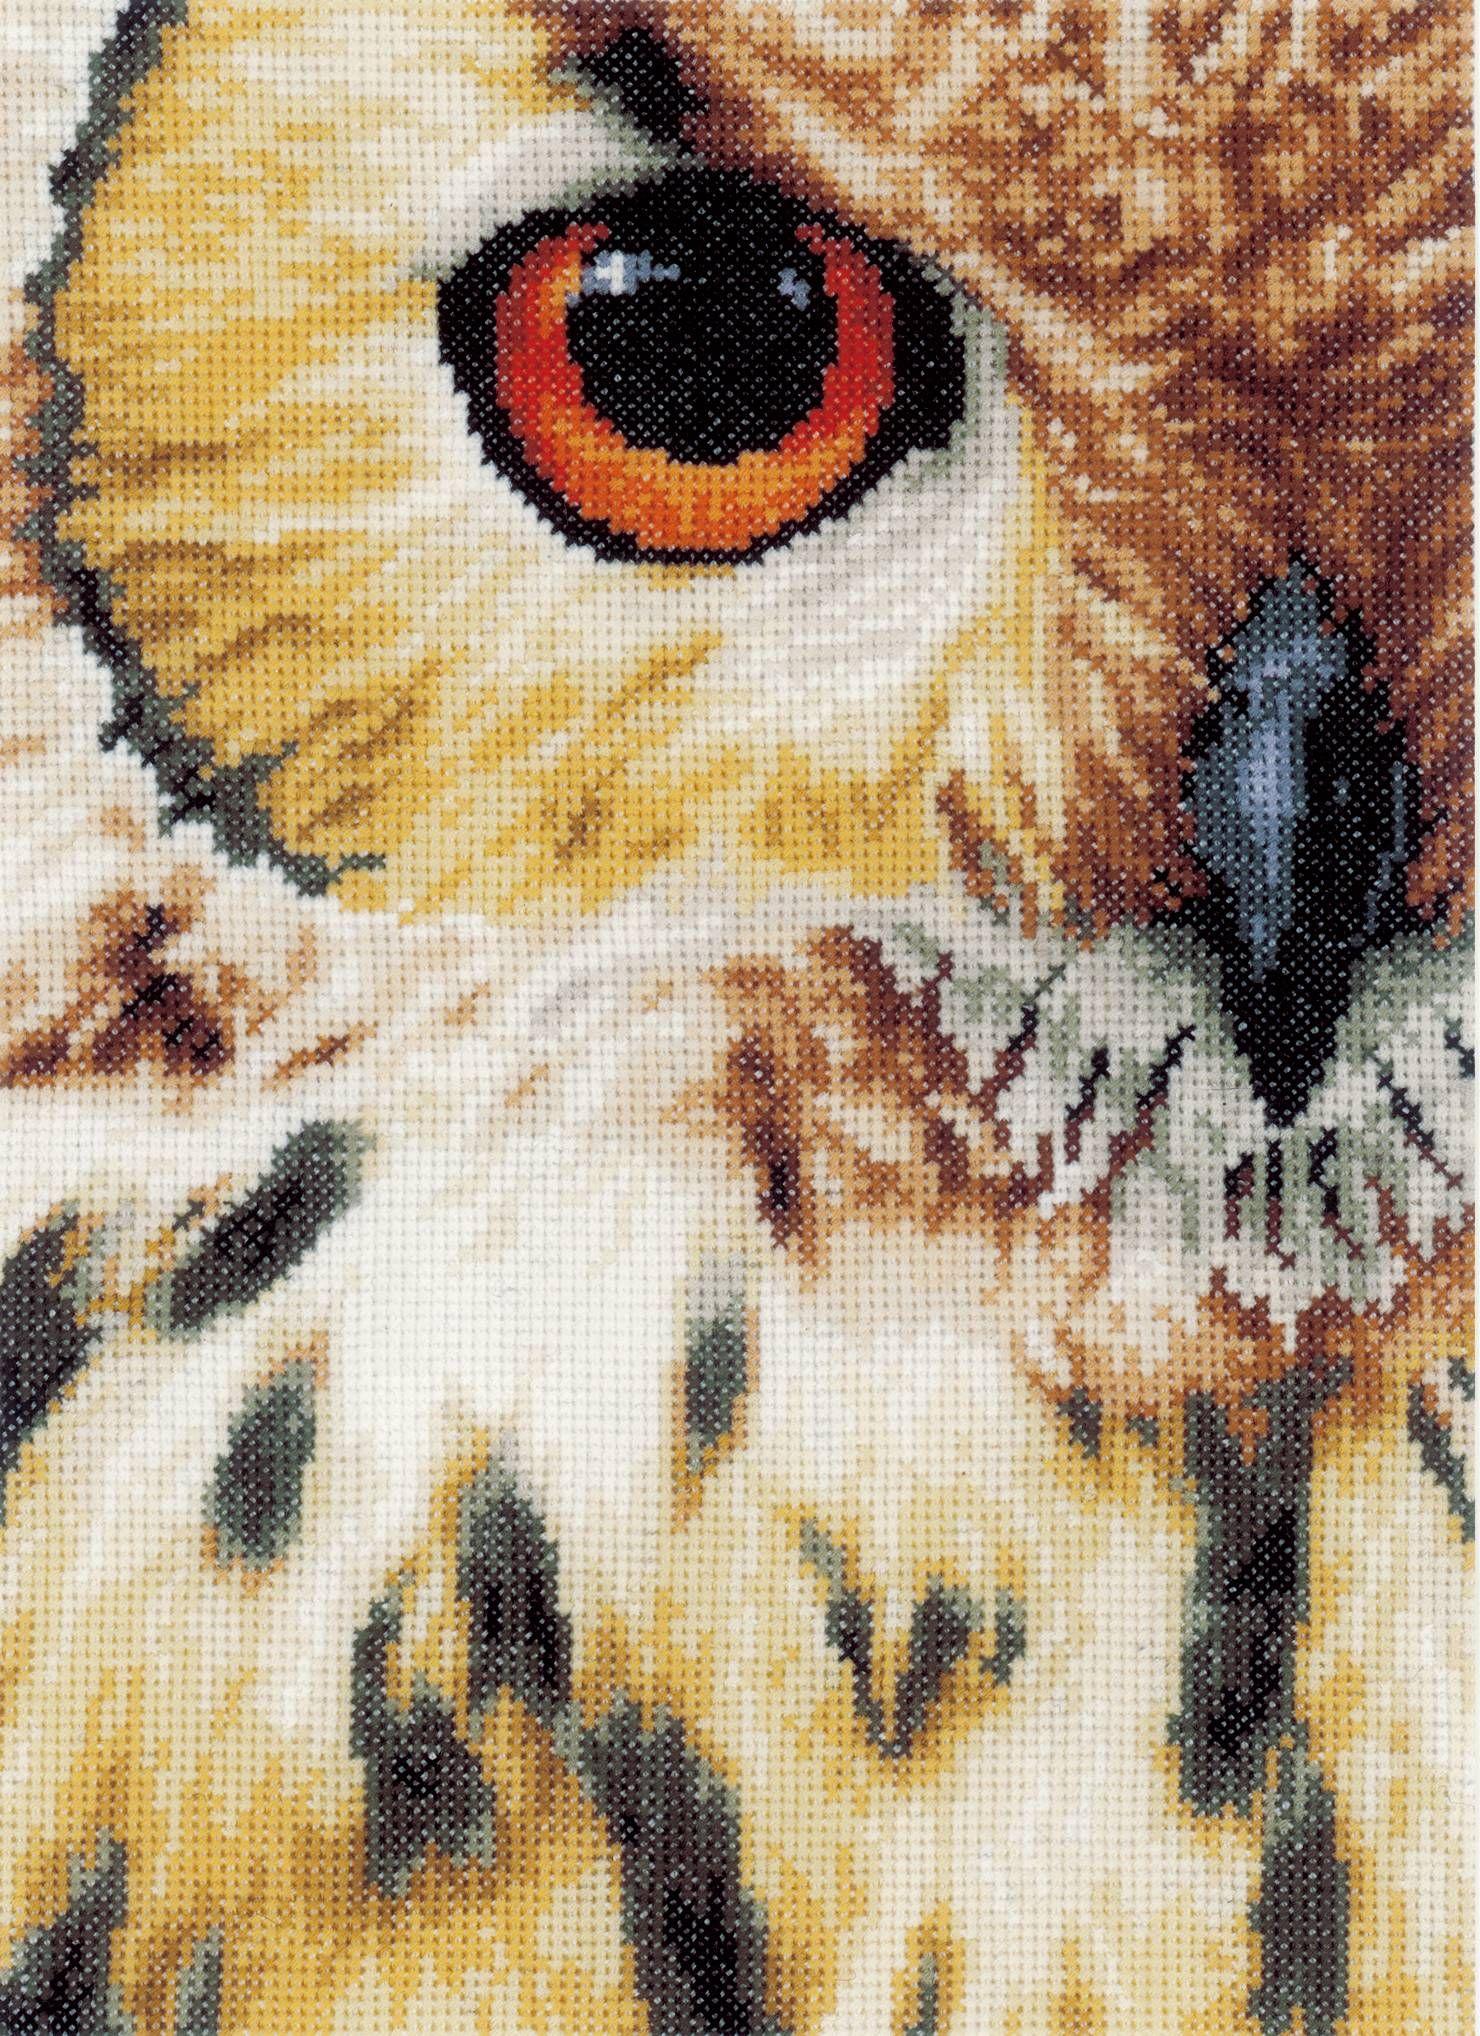 64-03 Cross Stitch Kit Owl Art